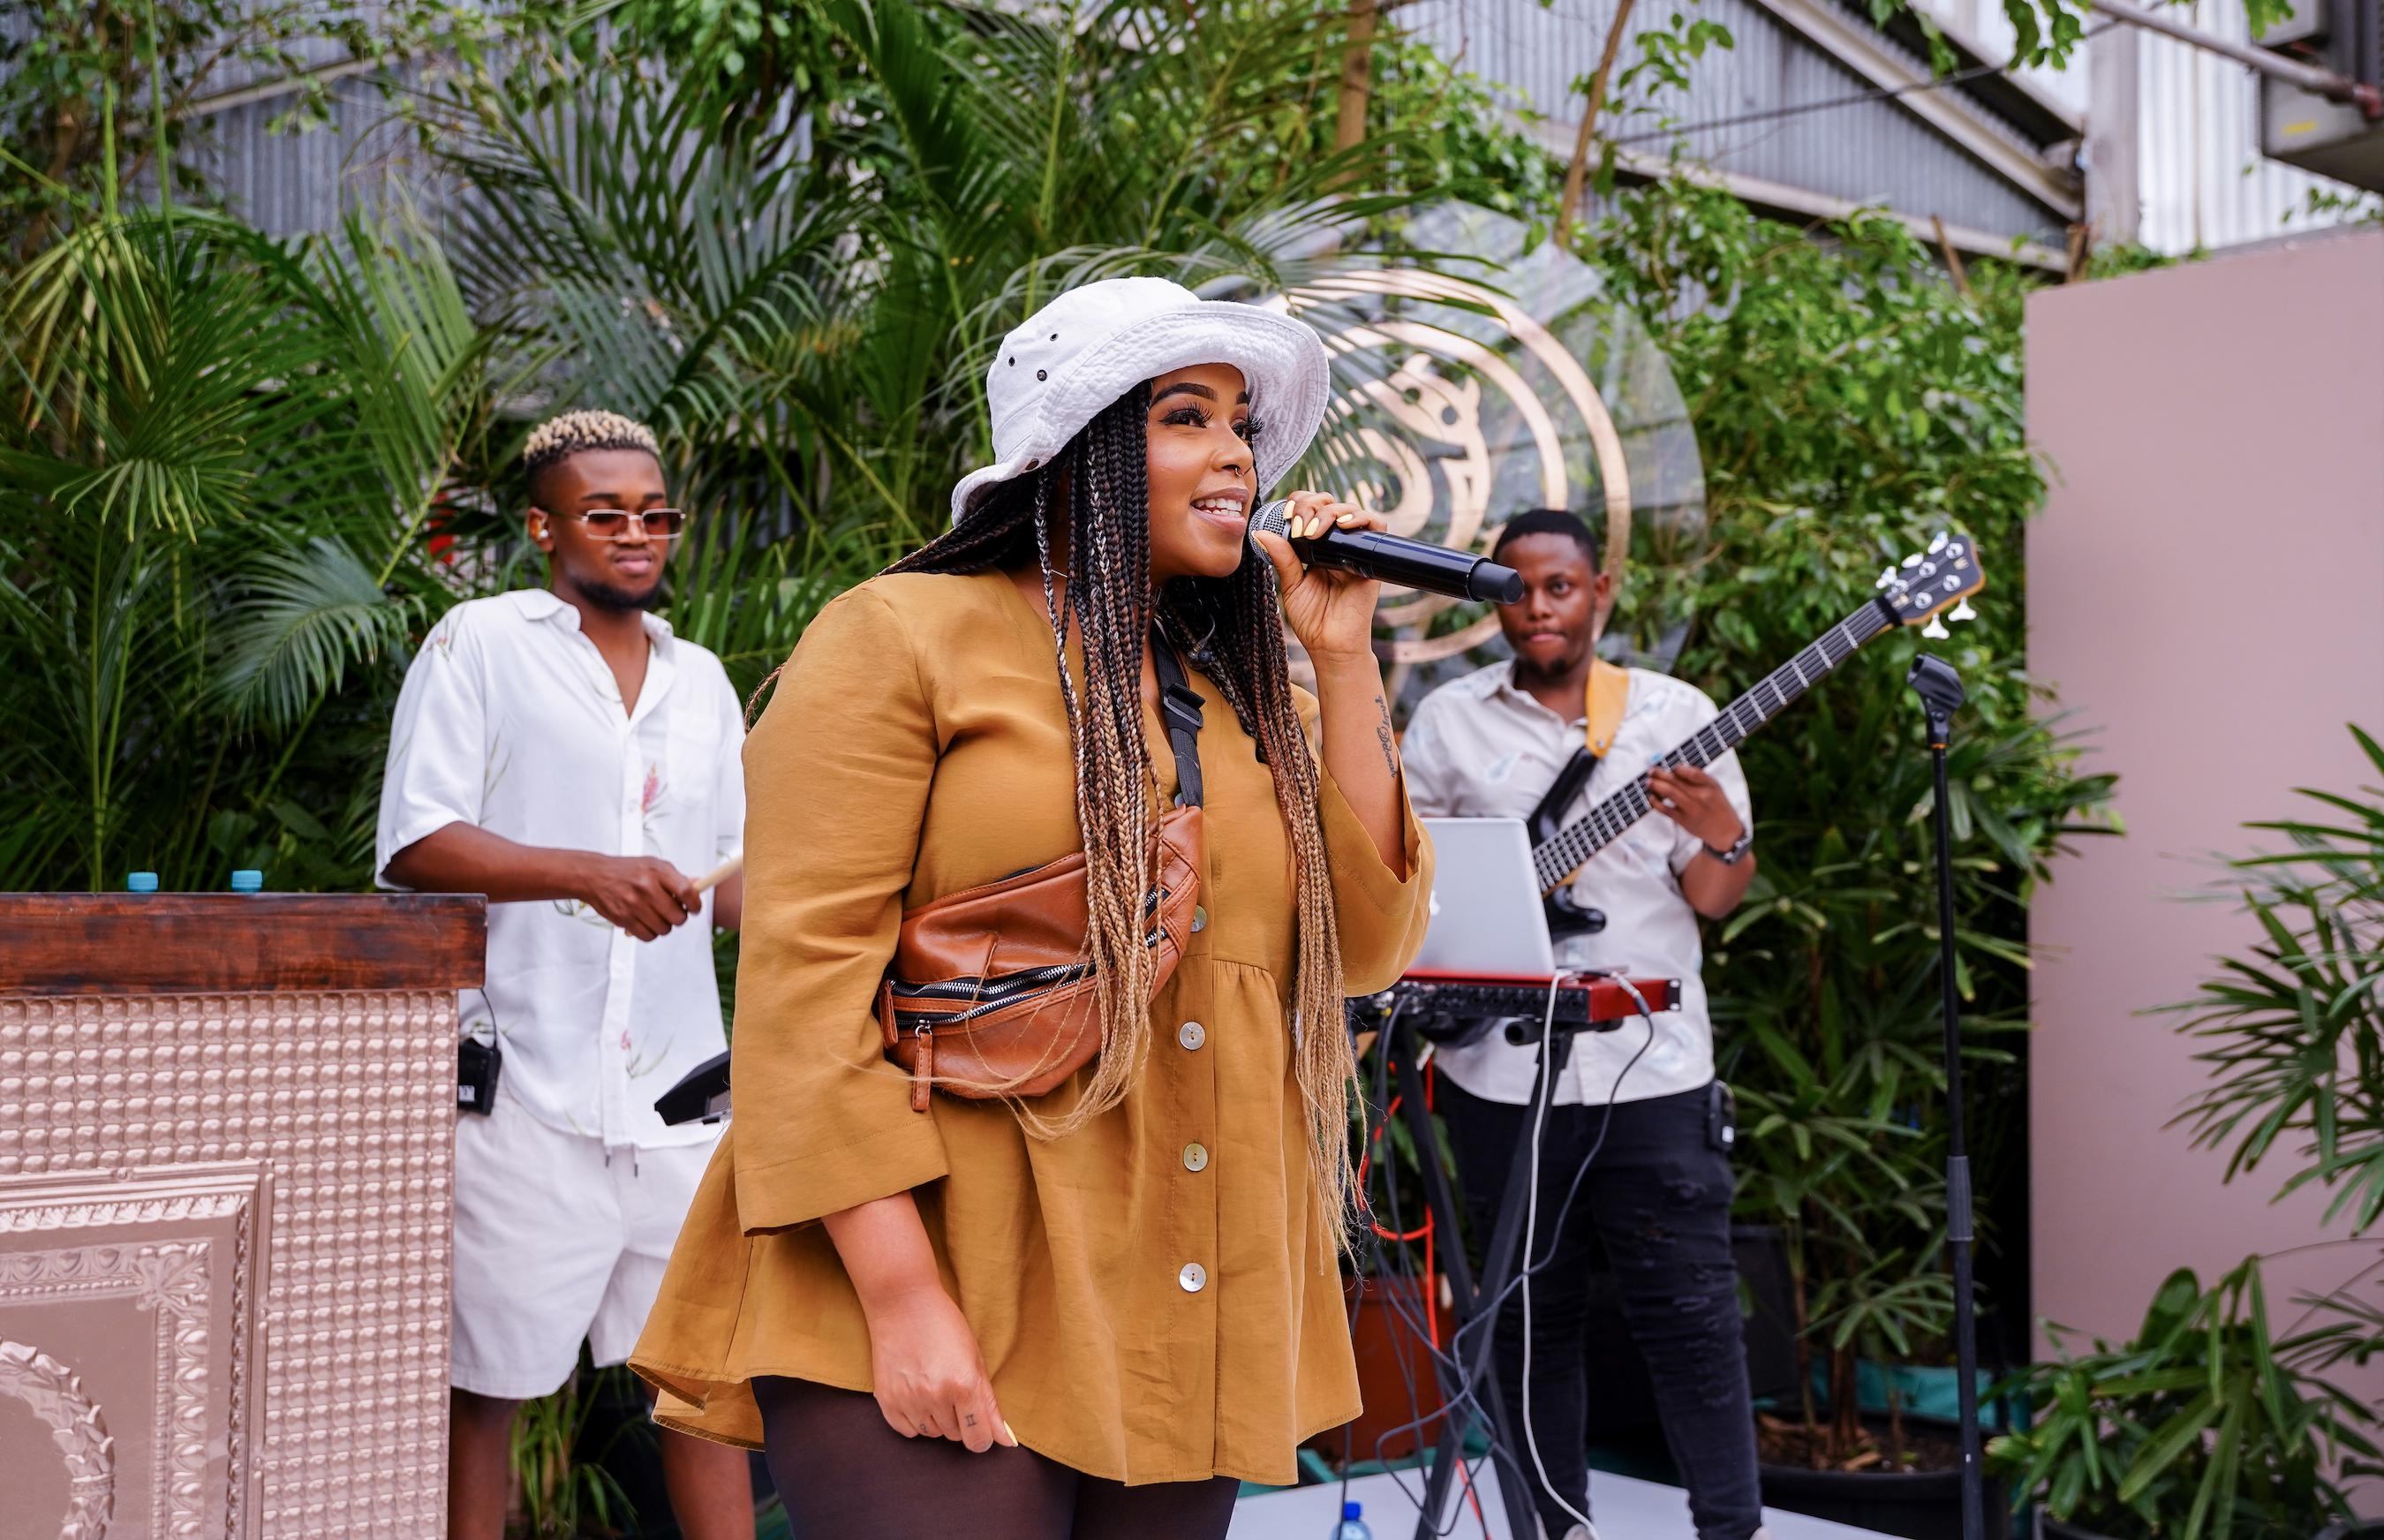 Shekinah performing at Brutal Fruit event